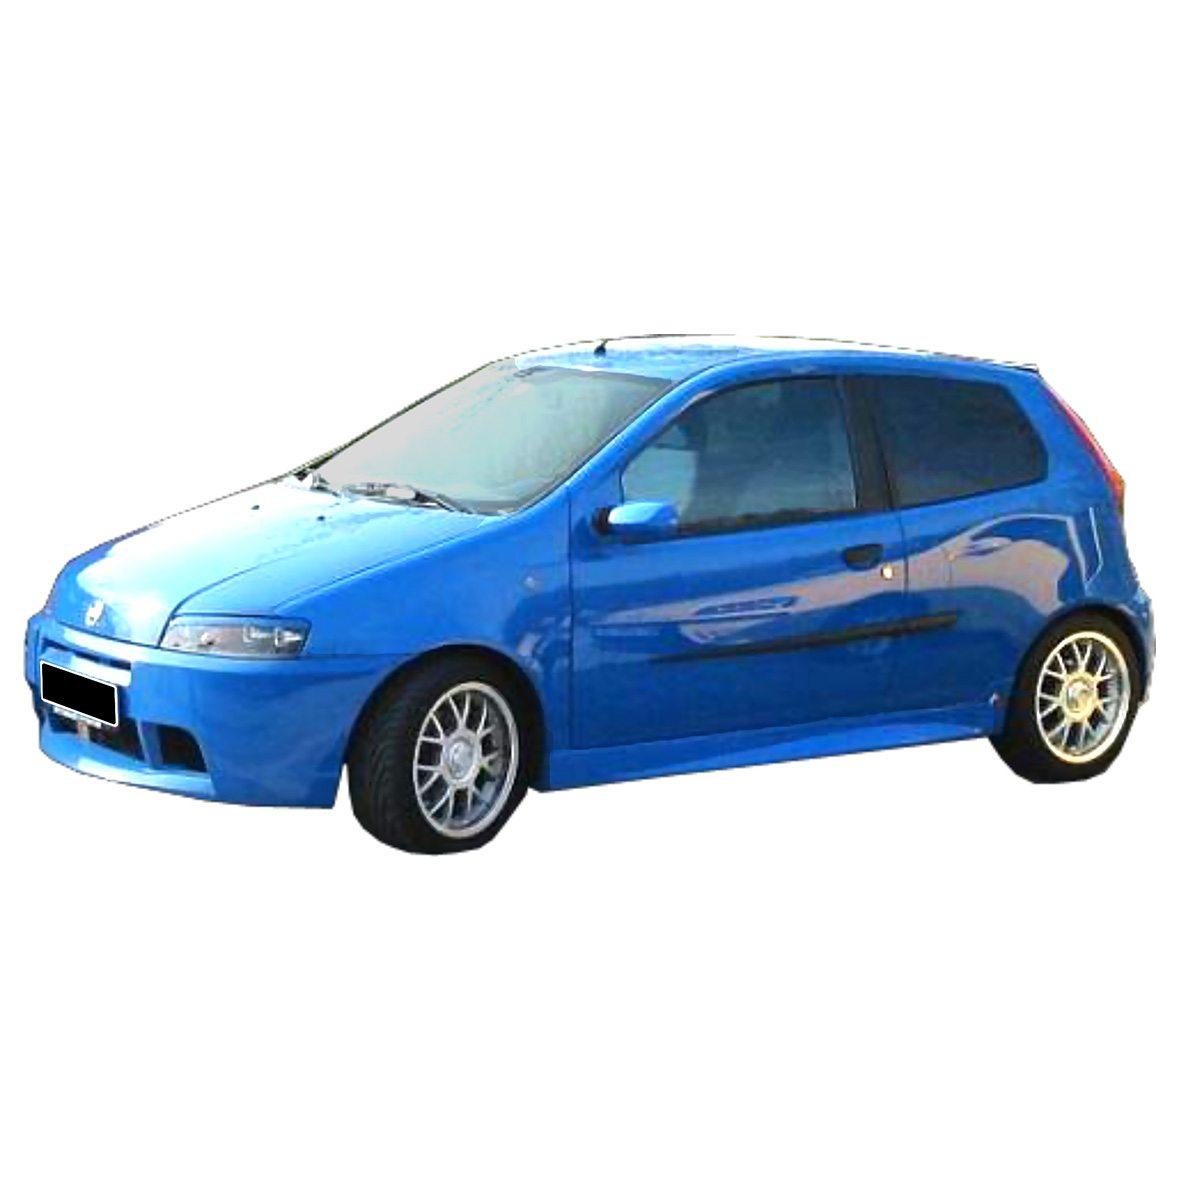 Fiat-Punto-2000-Abarth-Emb-EBU0030